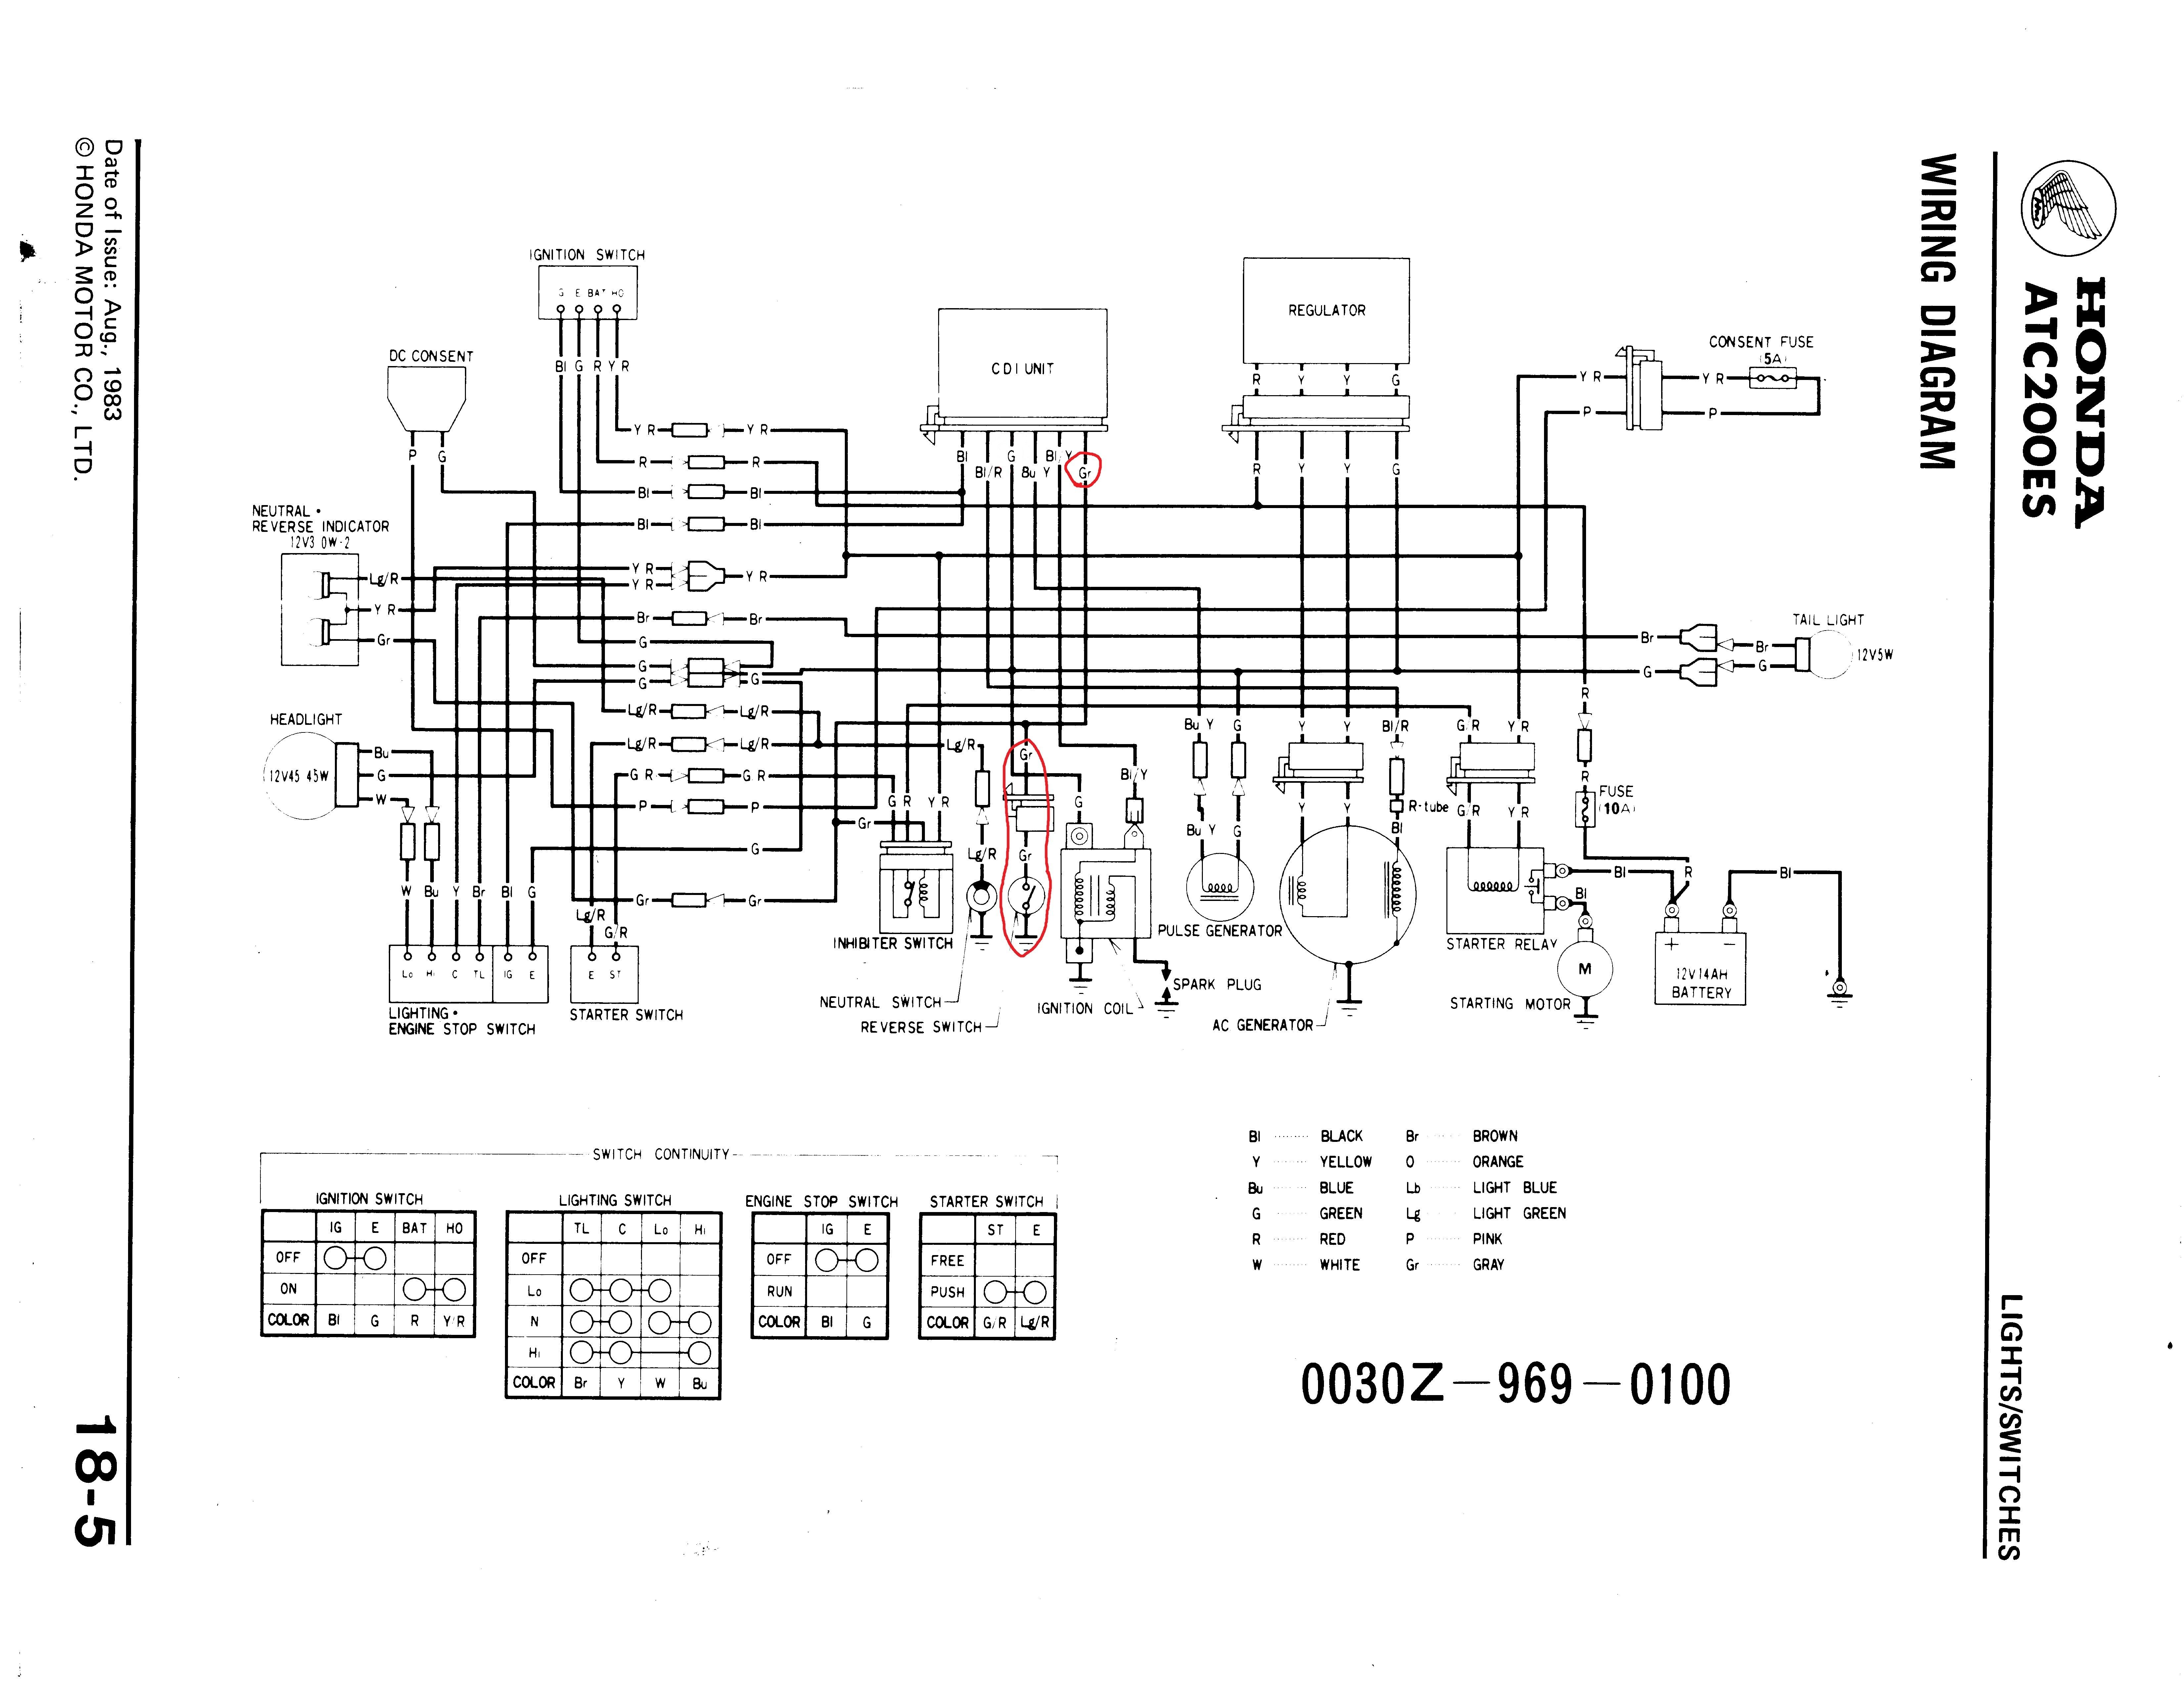 Honda Atv Wiring Diagram In 2020 Diagram Honda Ruckus Motorcycle Wiring